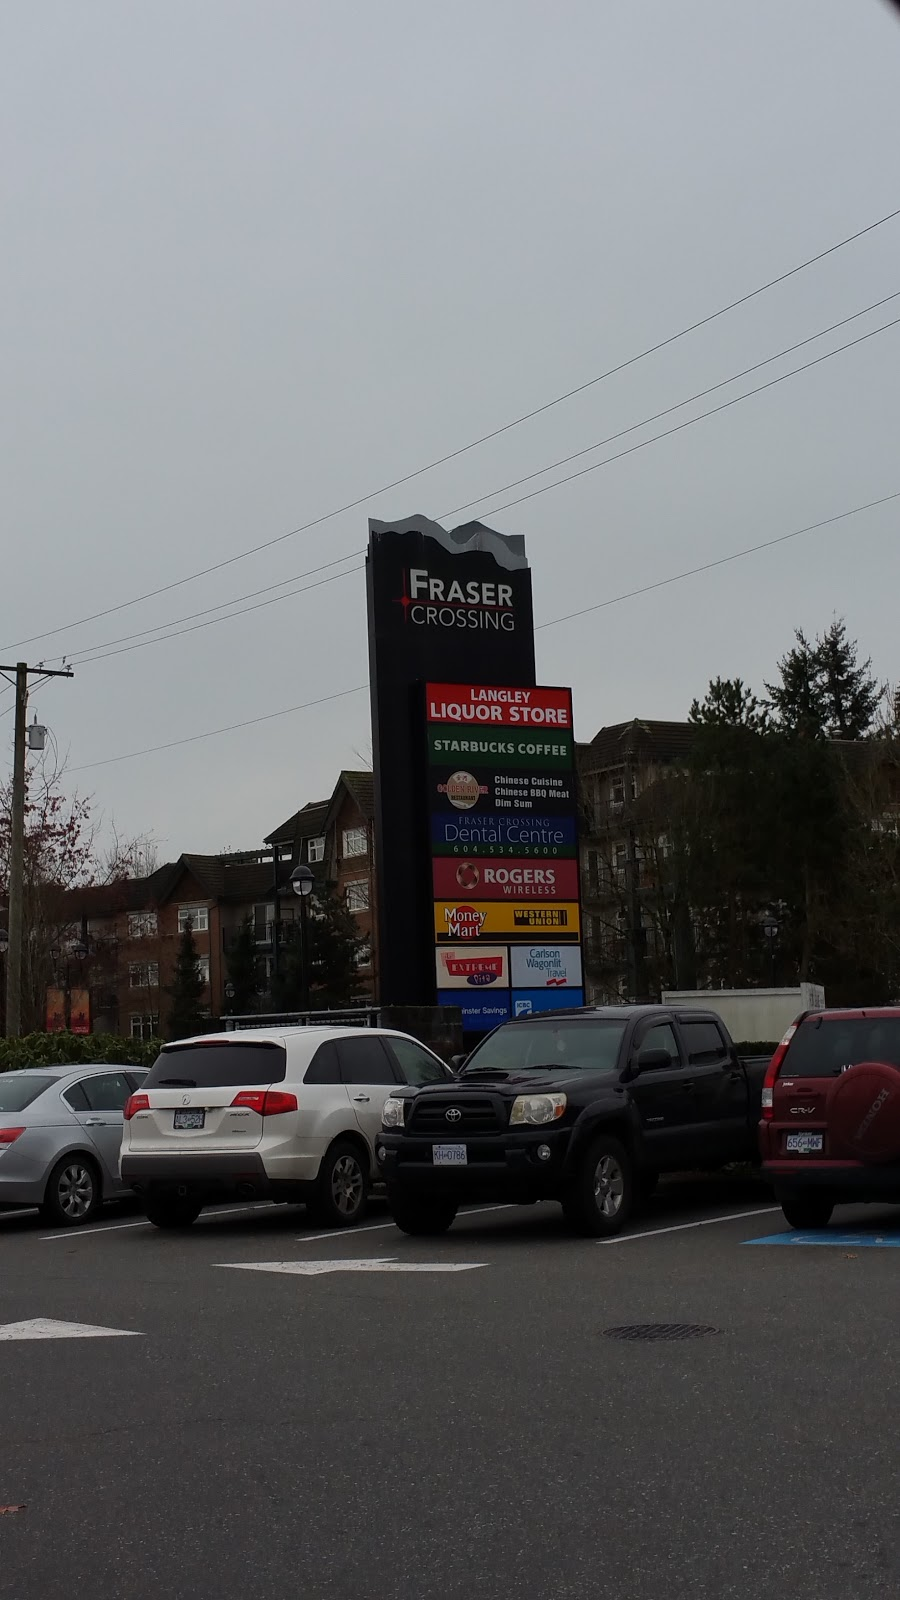 Fraser Crossing | dentist | 20811 Fraser Hwy, Langley City, BC V3A 4G7, Canada | 6045345600 OR +1 604-534-5600